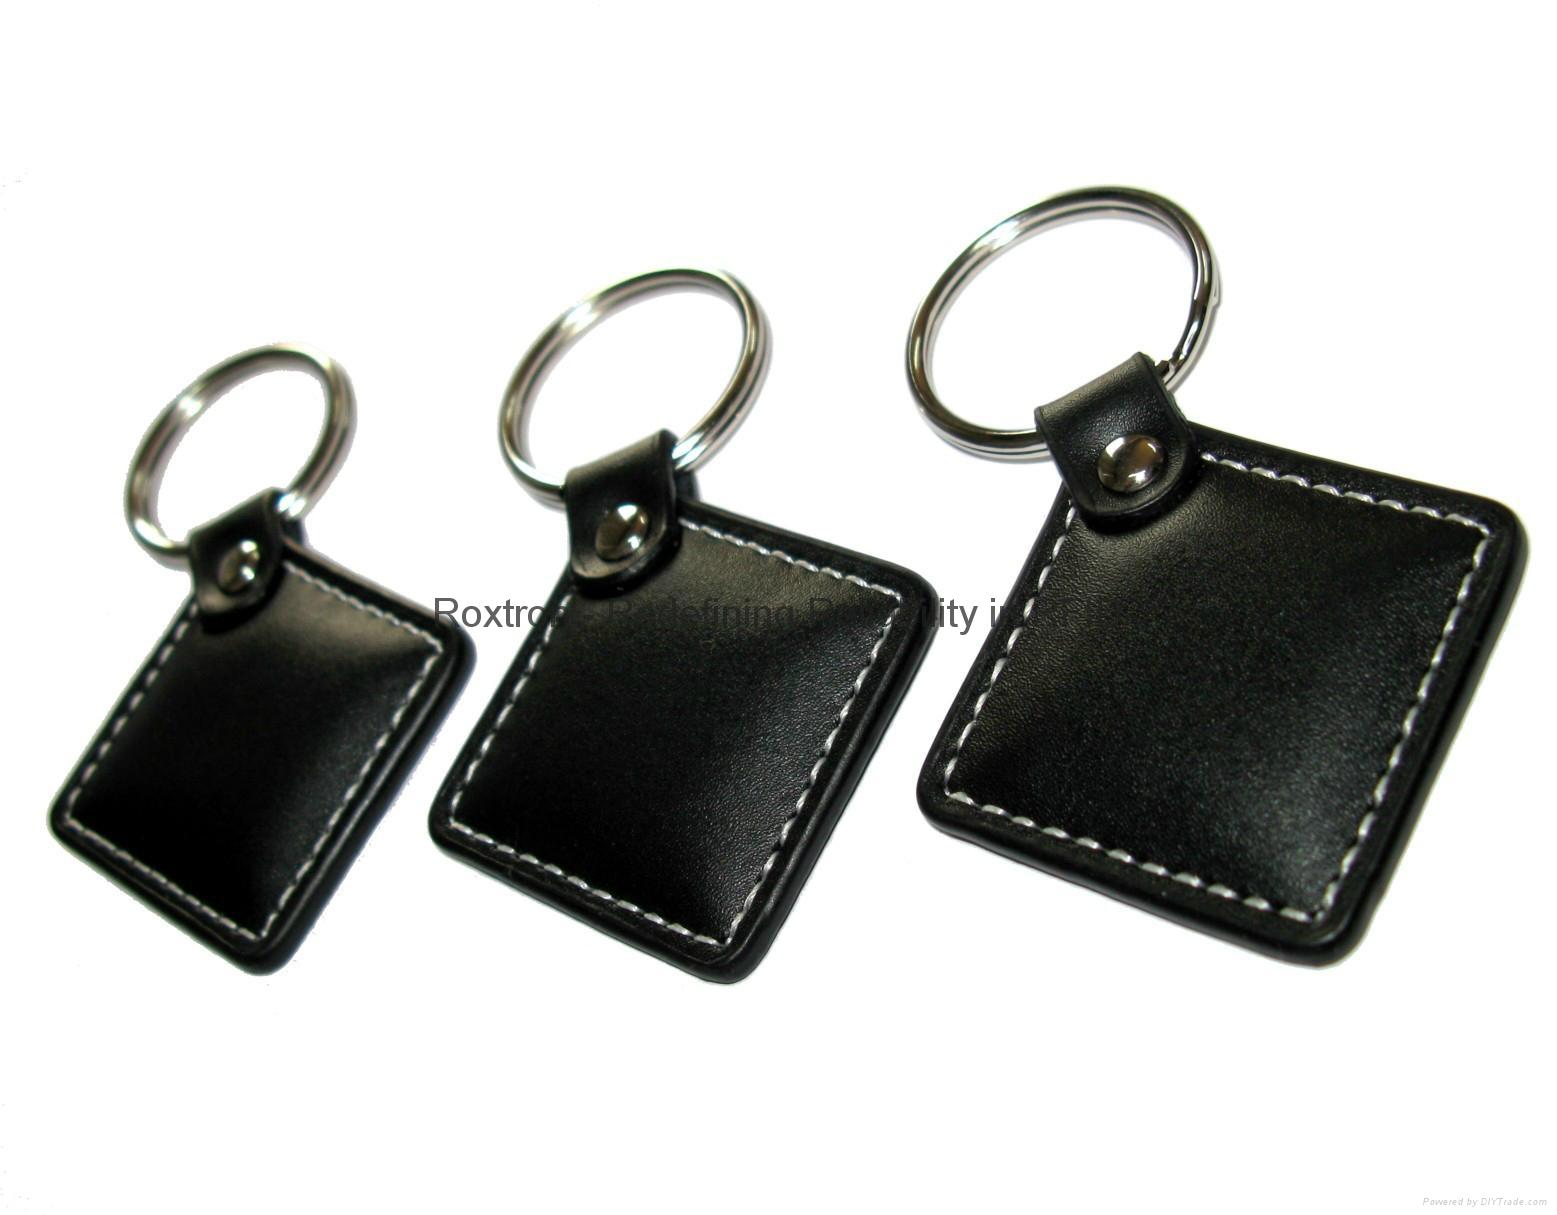 MIFARE Classic 1K RXK14 Leather Key Tag 7